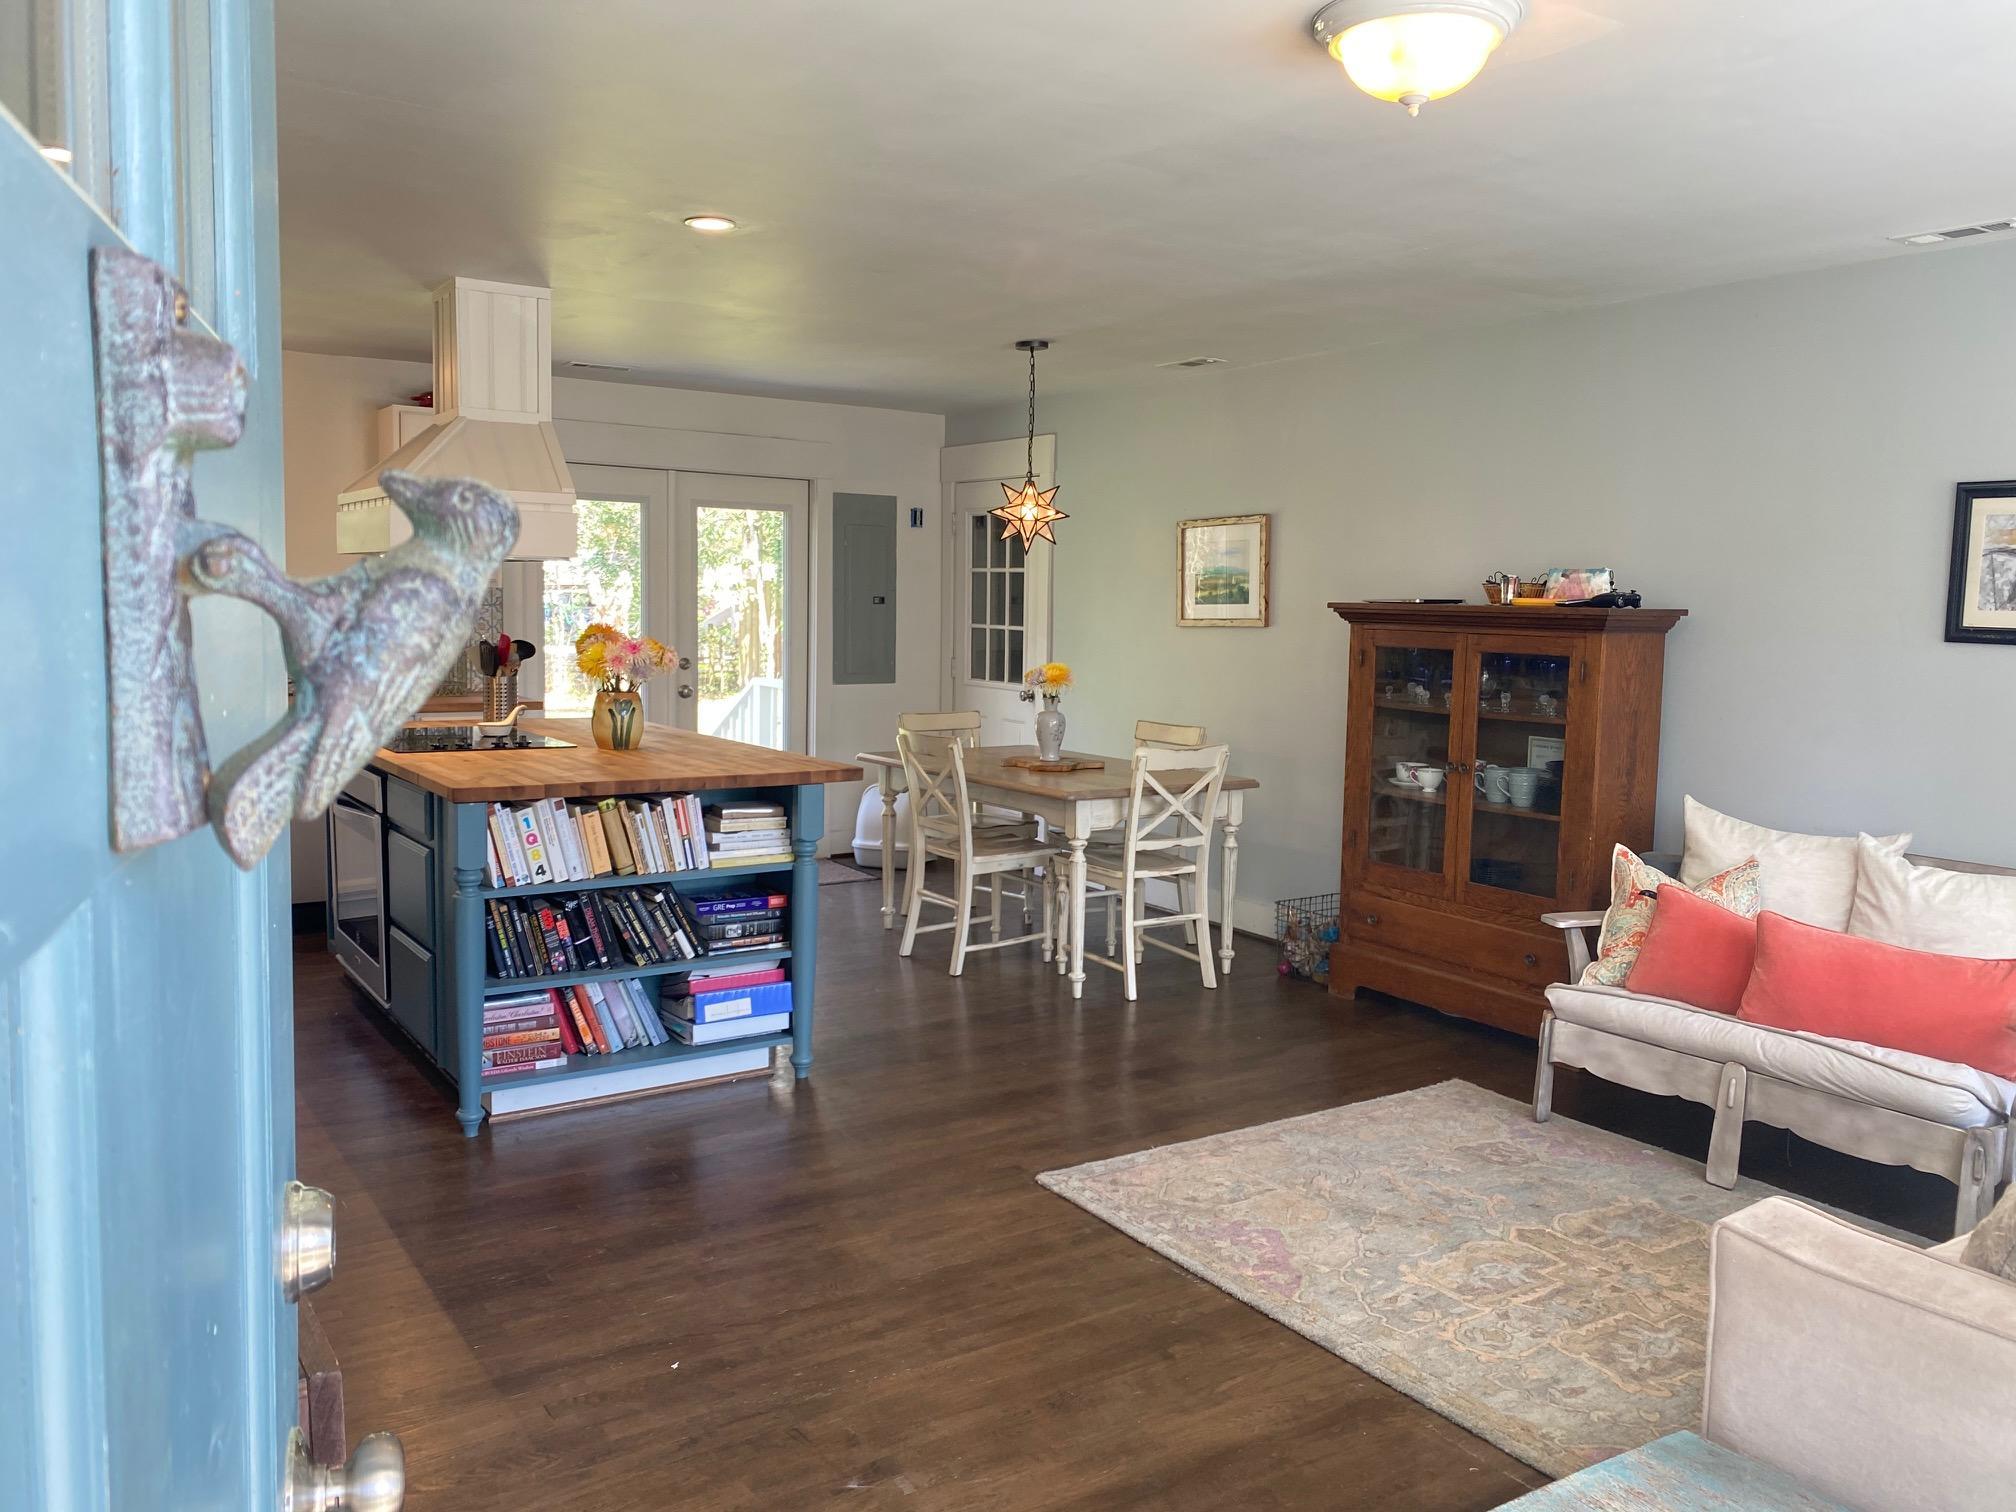 Stafford Heights Homes For Sale - 3472 Cynthia, Johns Island, SC - 20